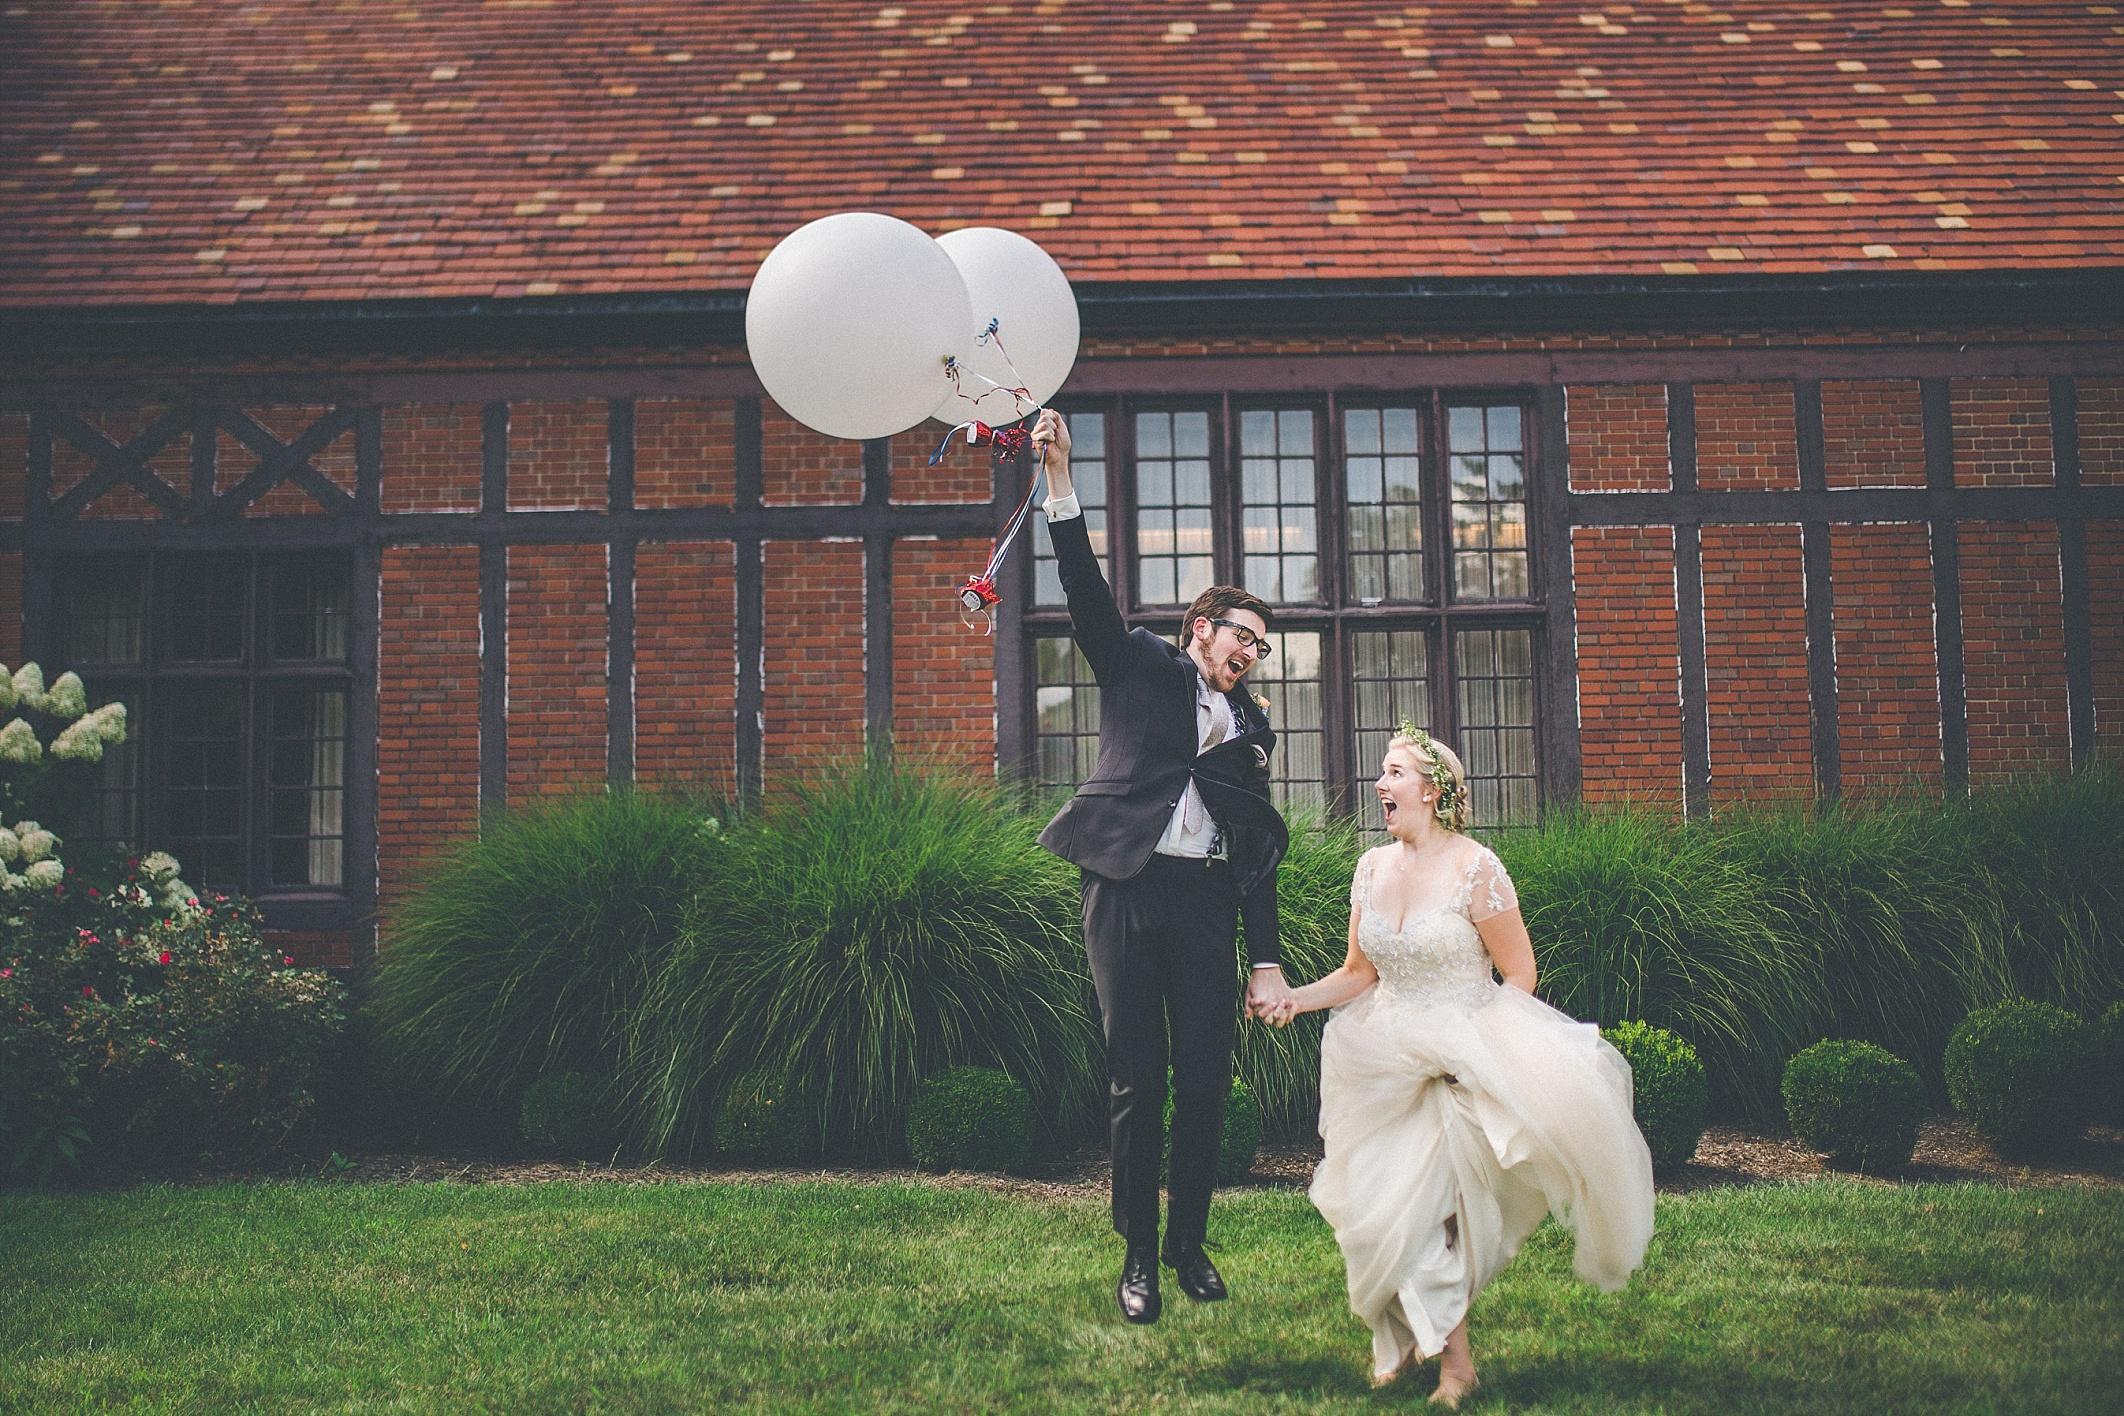 wedding-photographer-dayton-ohio_0102.jpg